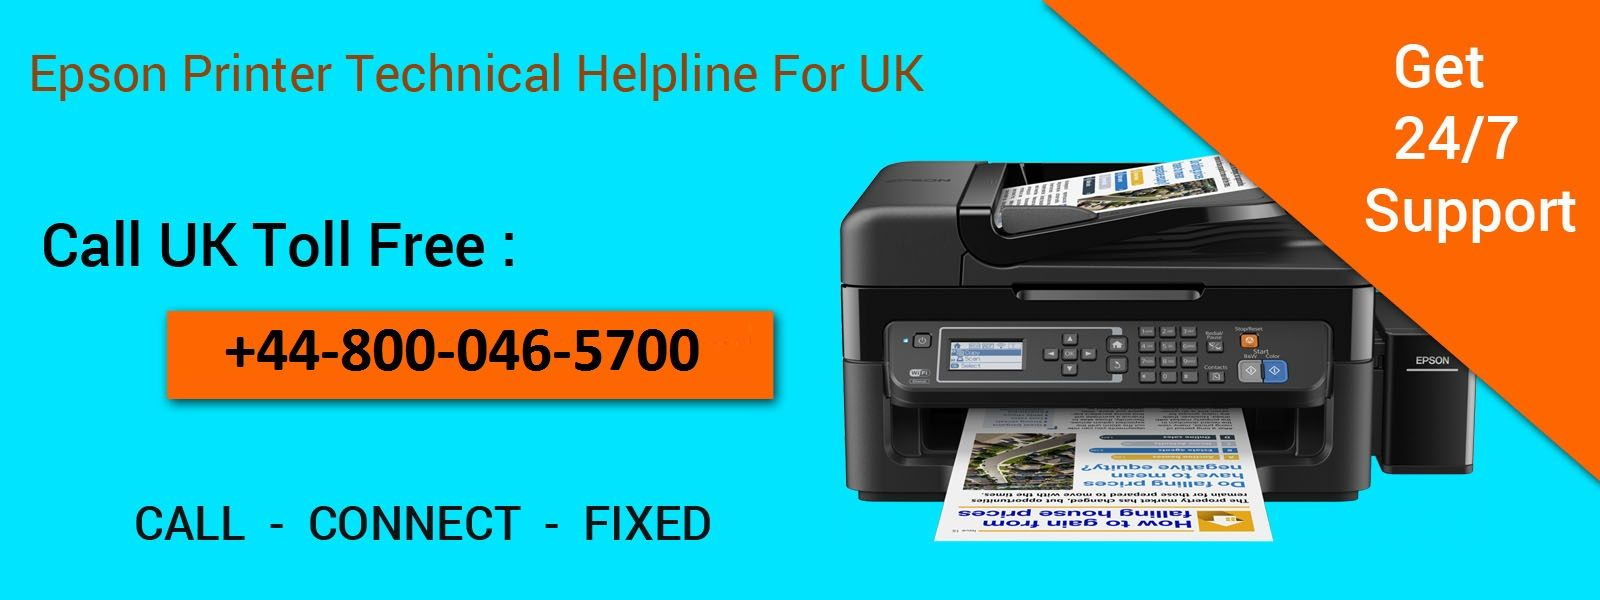 epson printers troubleshooting - Ataum berglauf-verband com